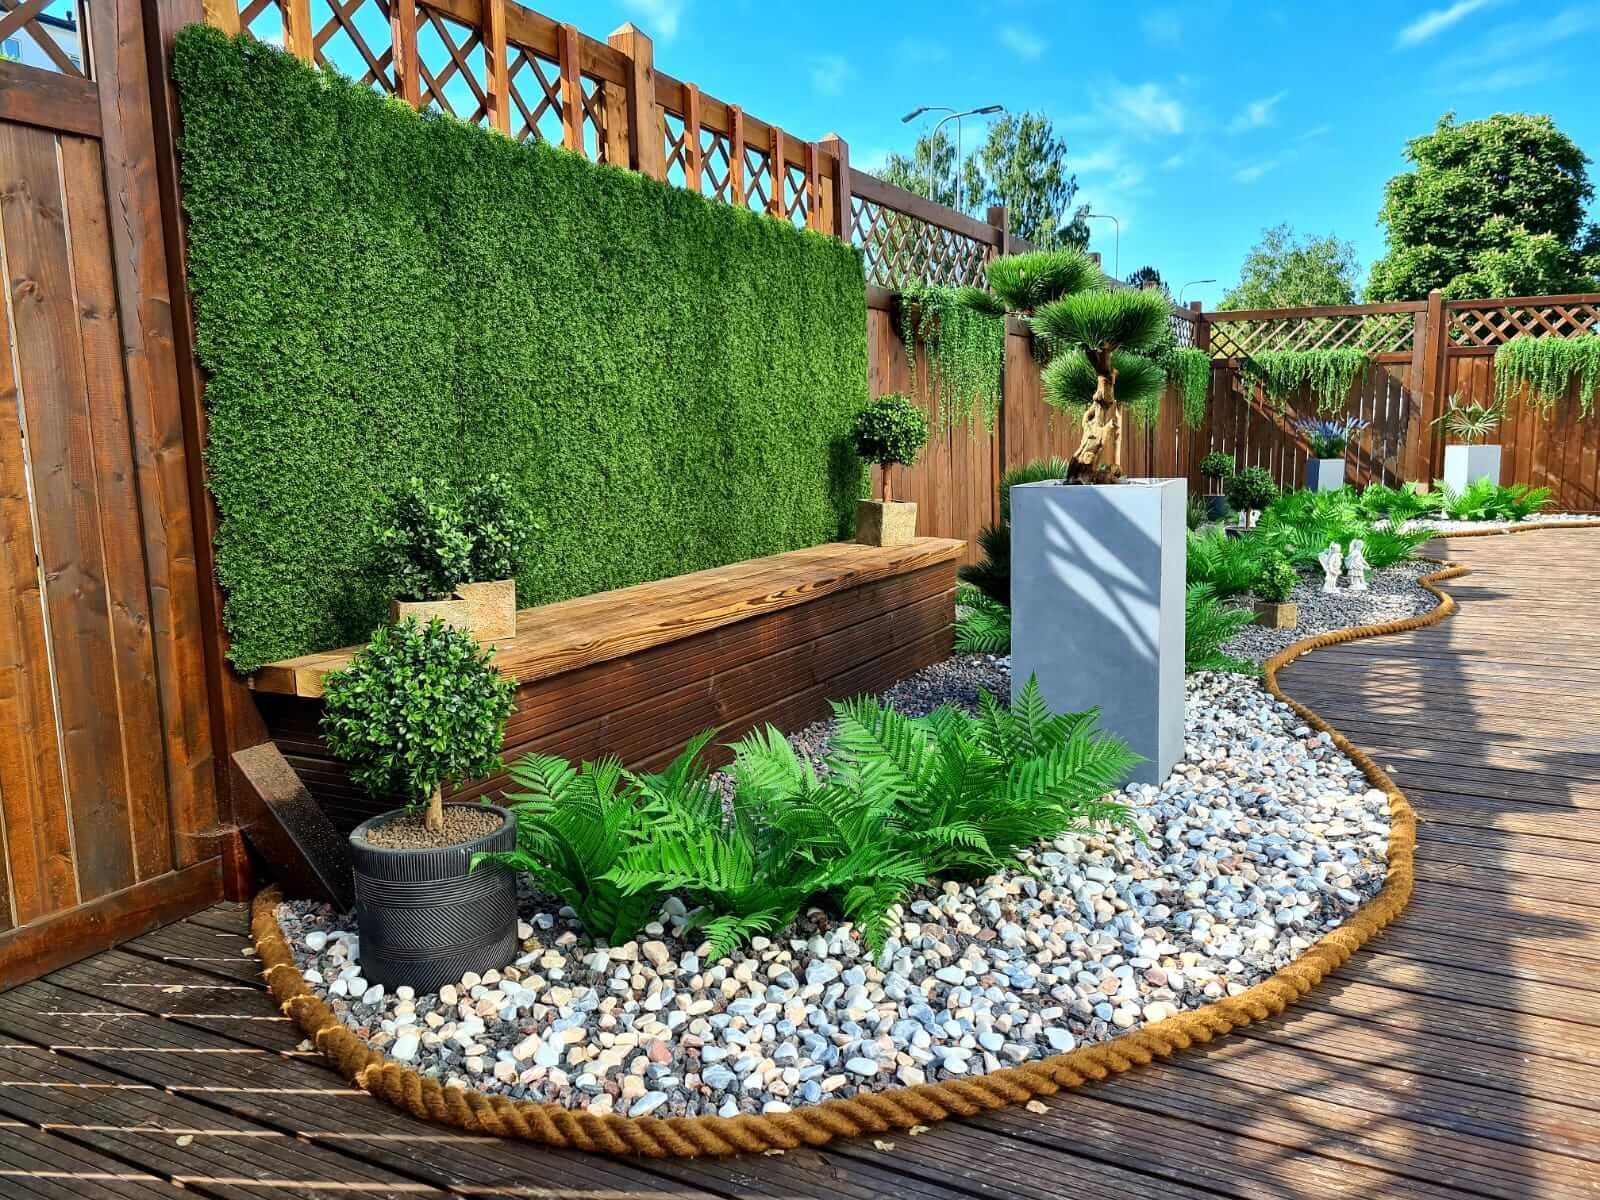 kunsttaimed mustamäe elamus spa terrassil